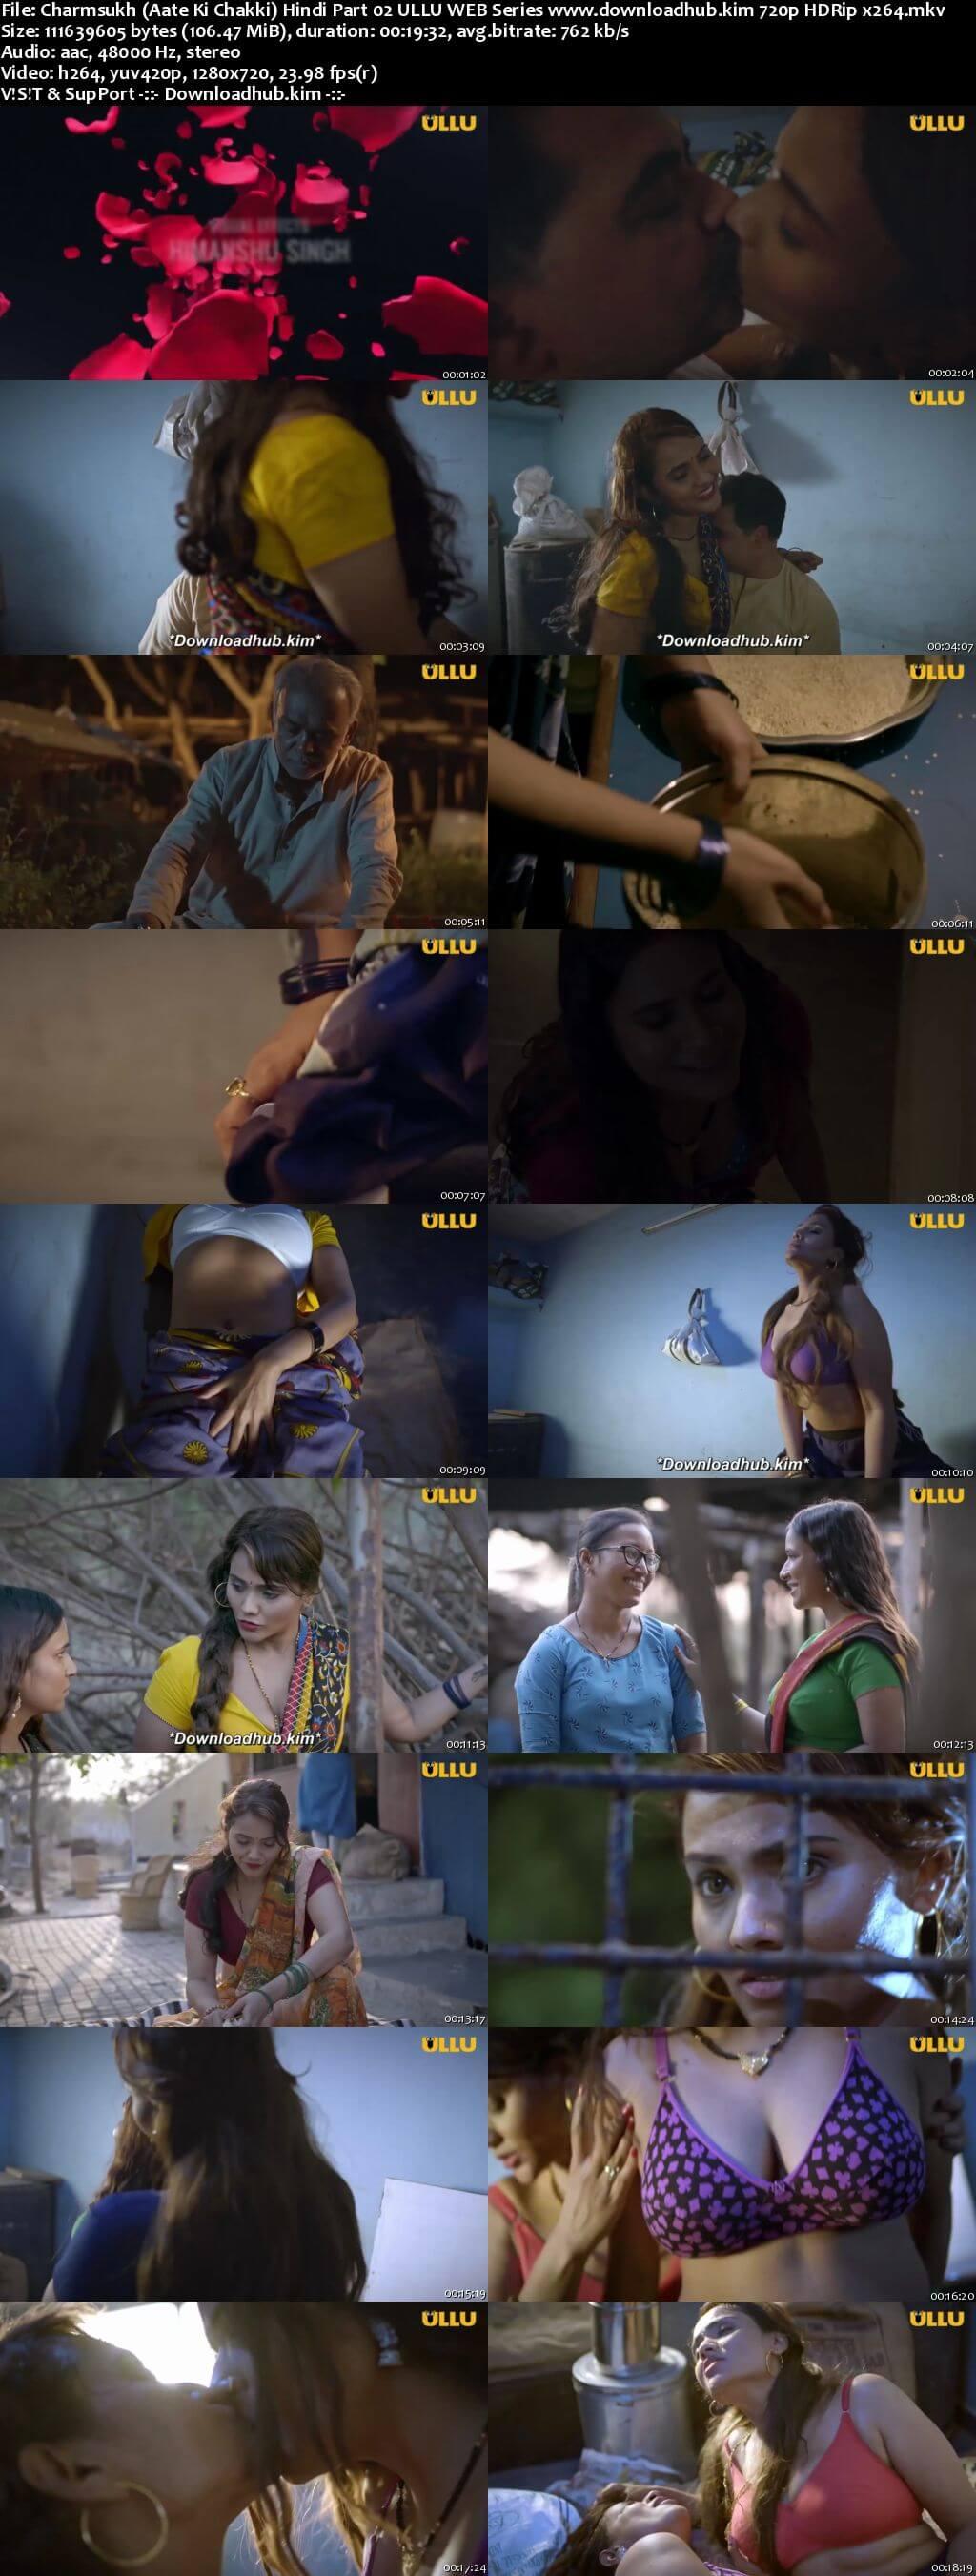 Charmsukh (Aate Ki Chakki) Hindi Part 02 ULLU WEB Series 720p HDRip x264